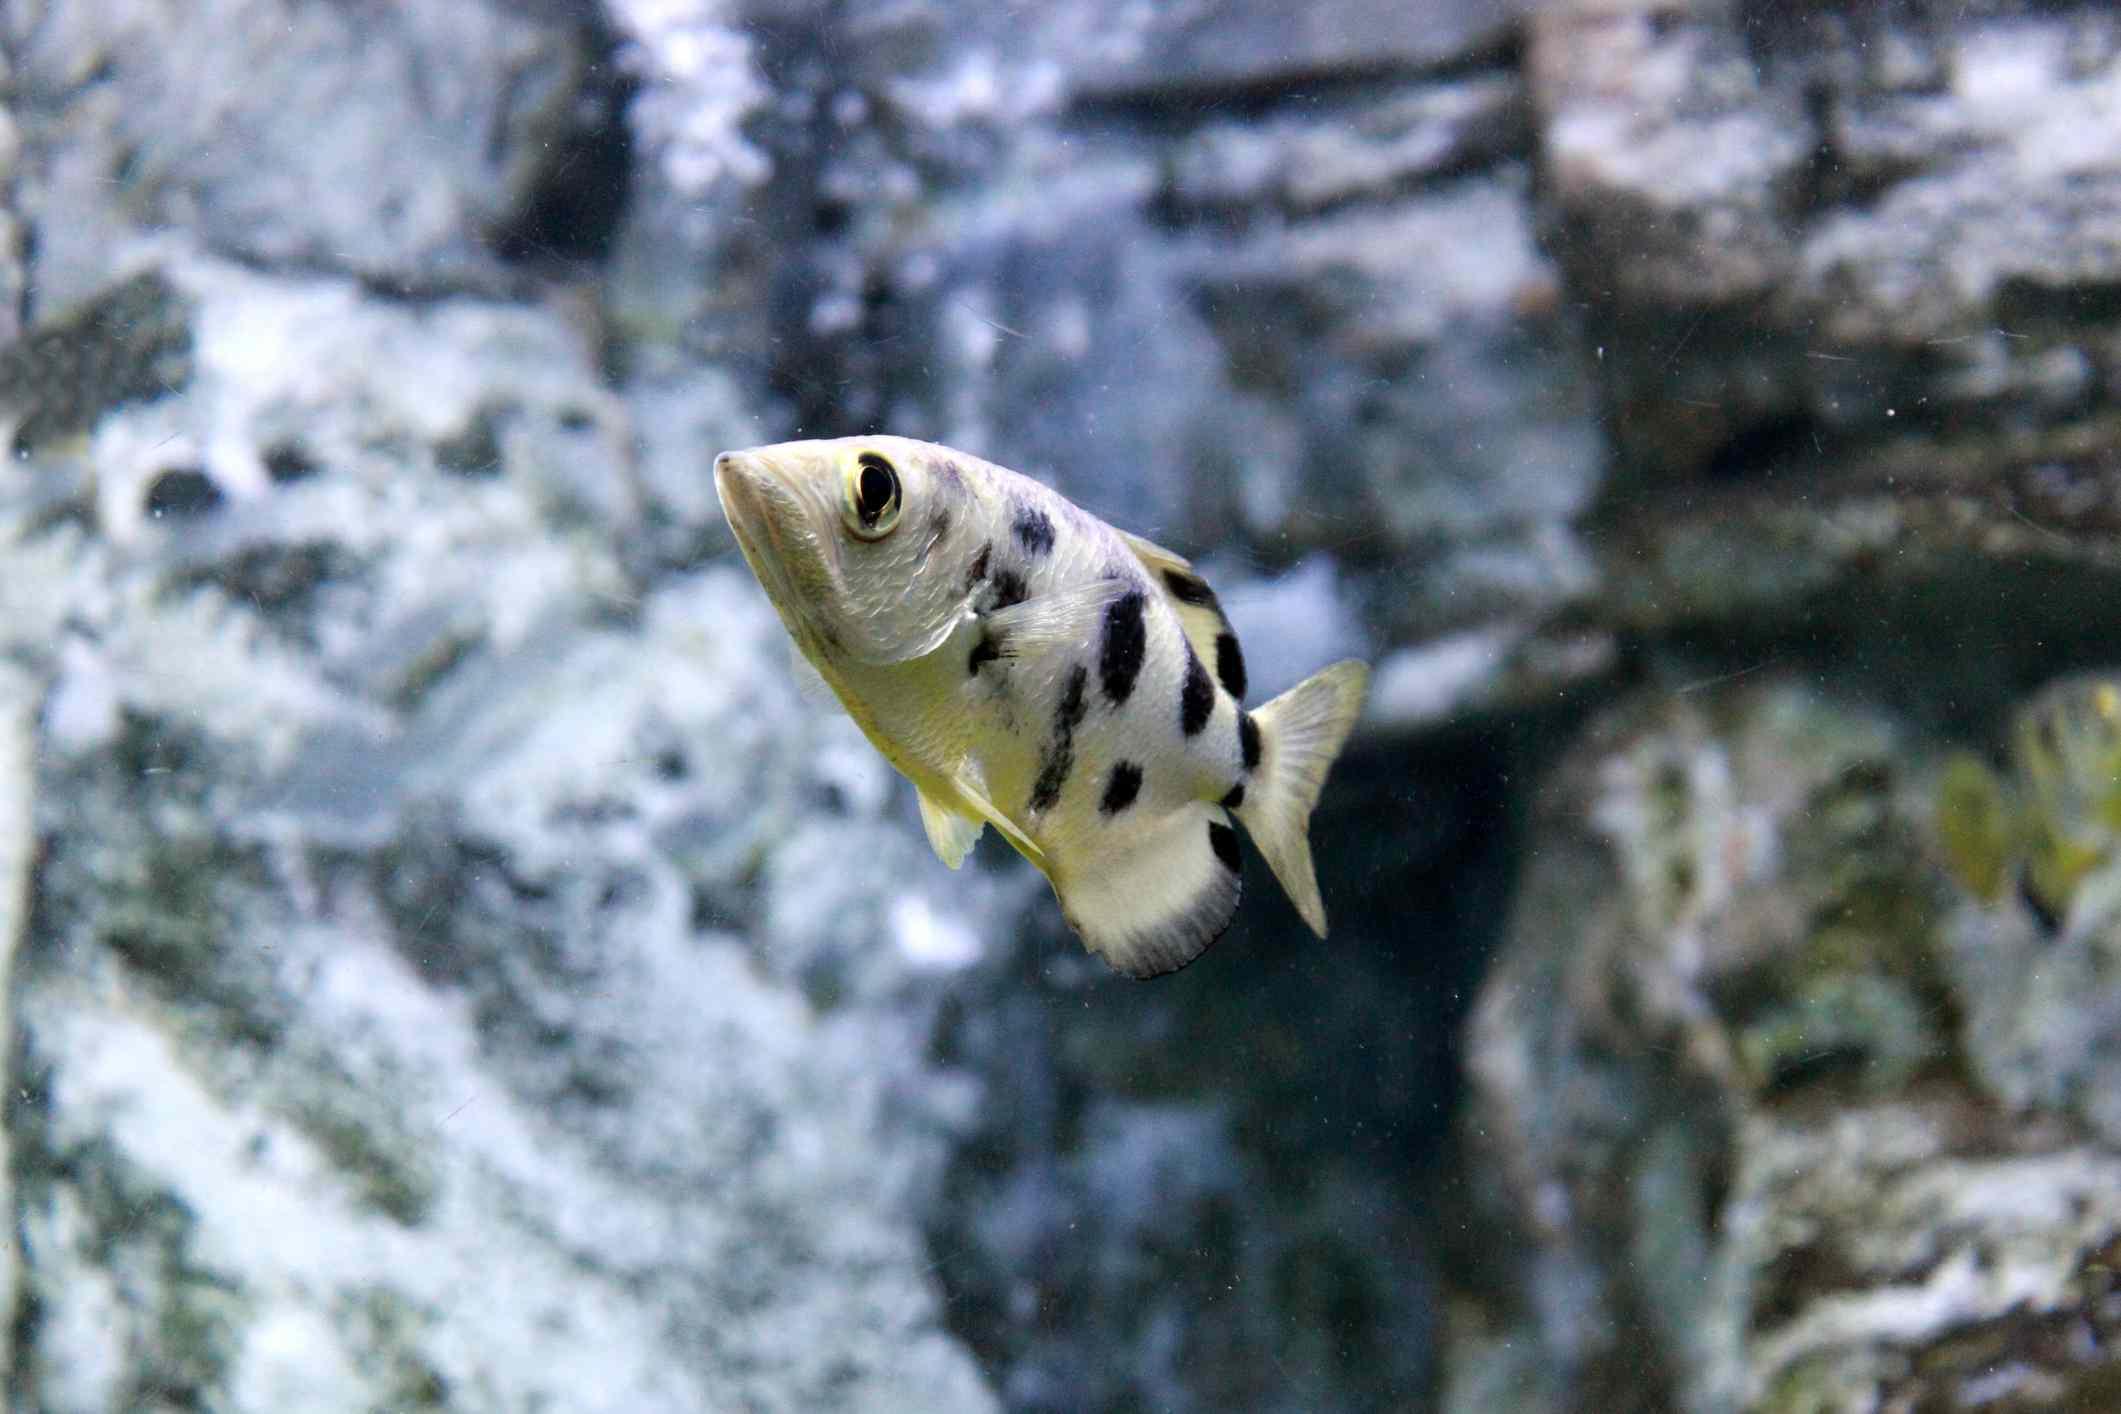 A black spotted archerfish swimming near gray rocks underwater